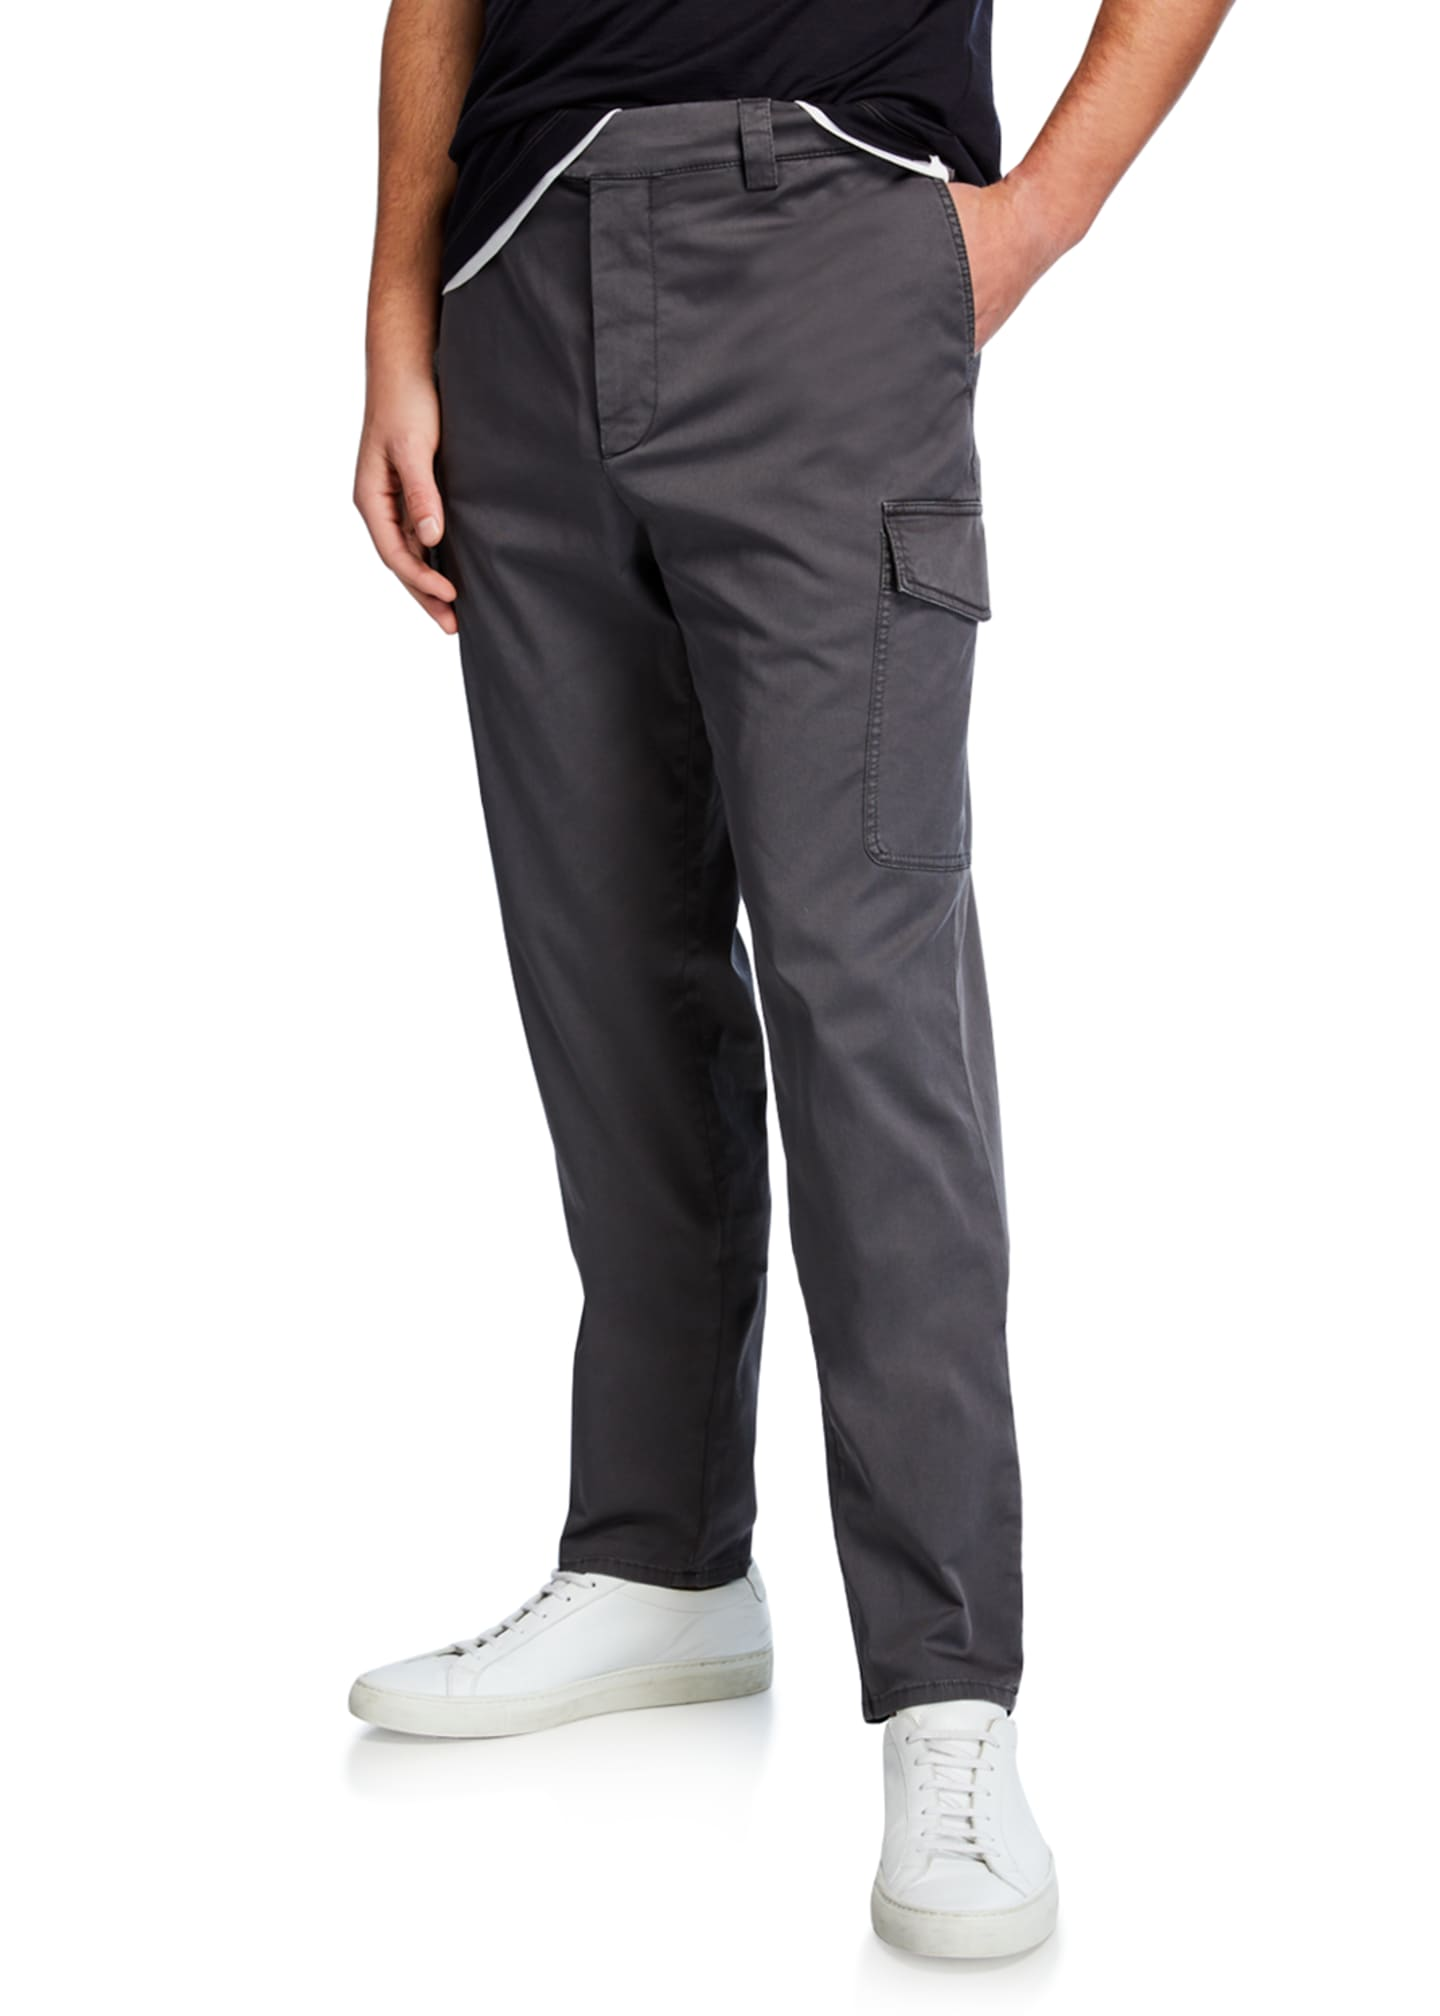 Brunello Cucinelli Men's Leisure-Fit Cargo Pants